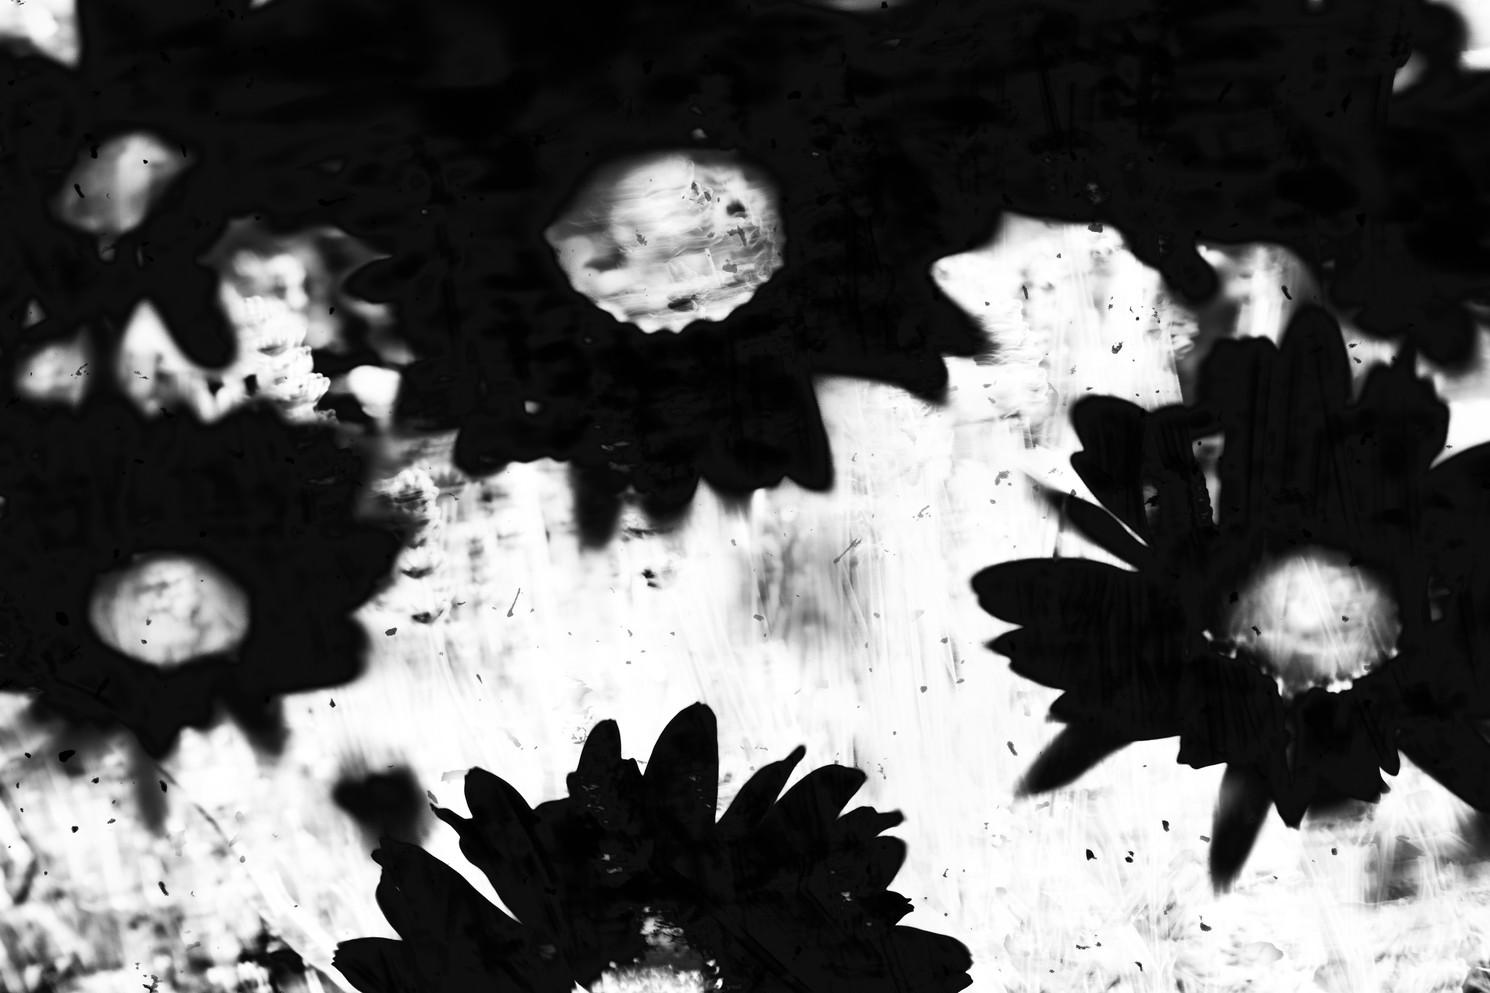 The Garden of Persephone 025